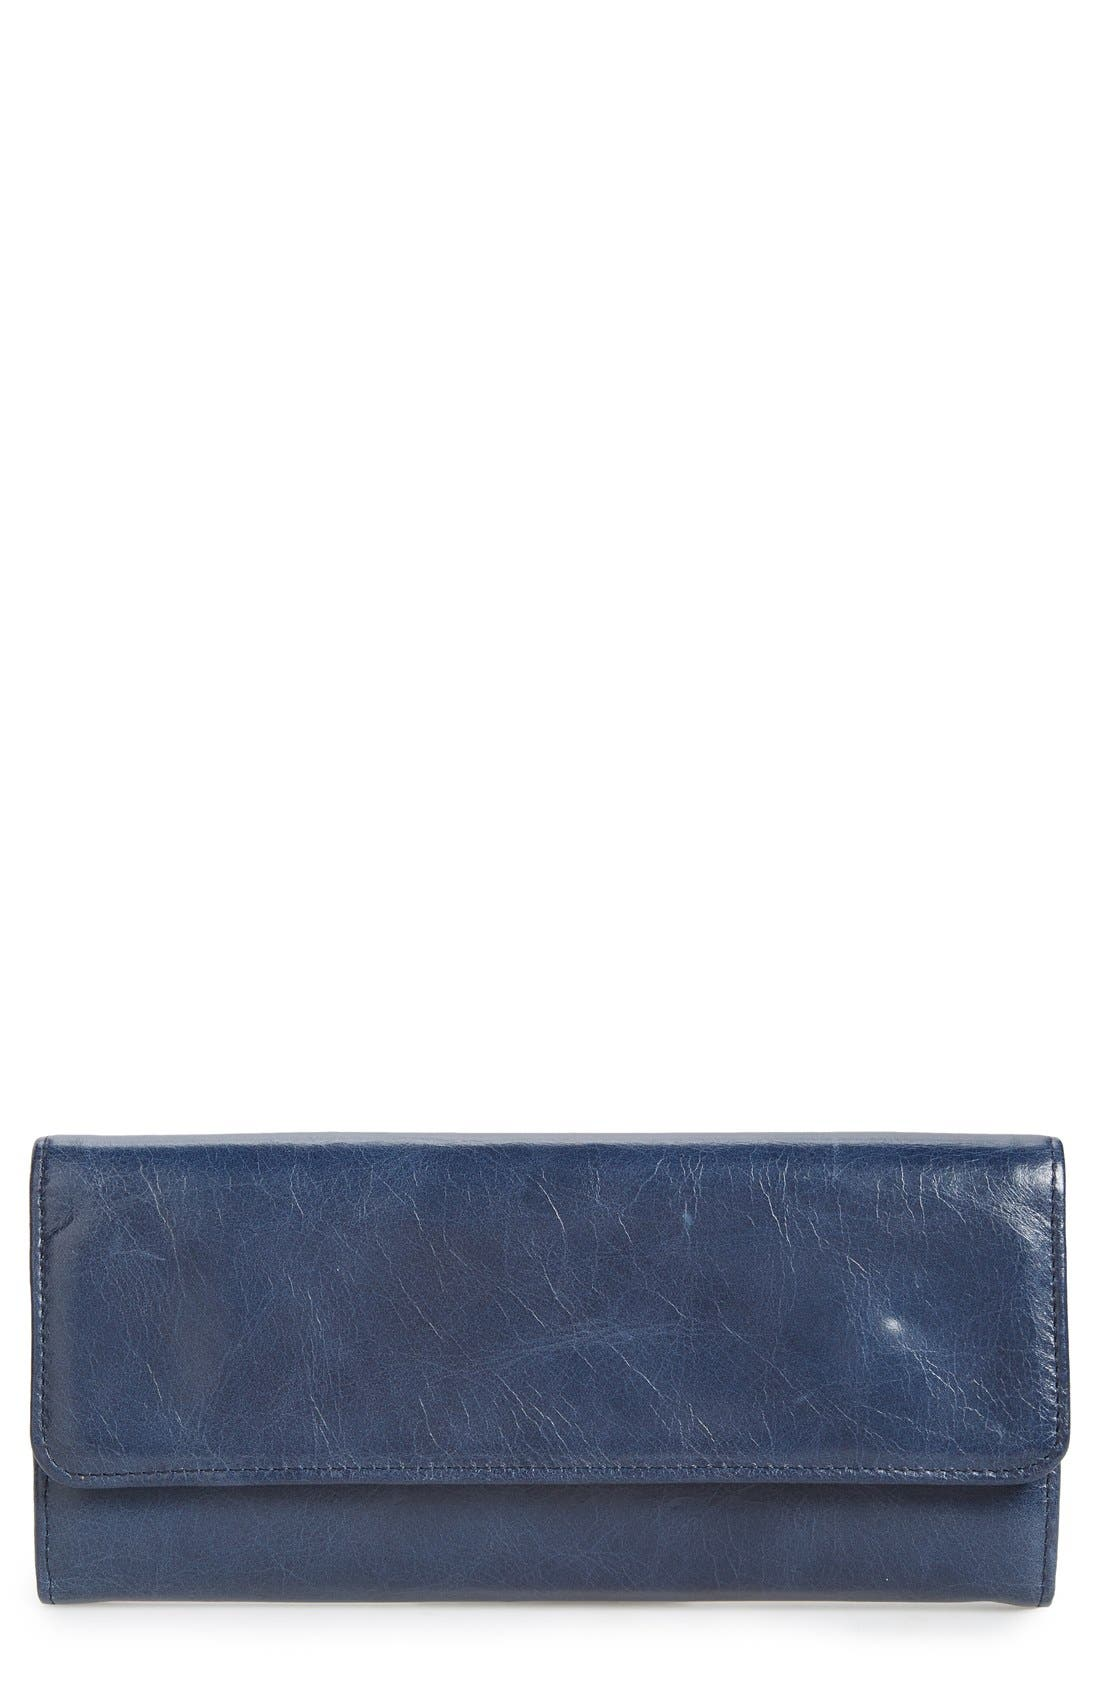 'Sadie' Leather Wallet,                             Main thumbnail 41, color,